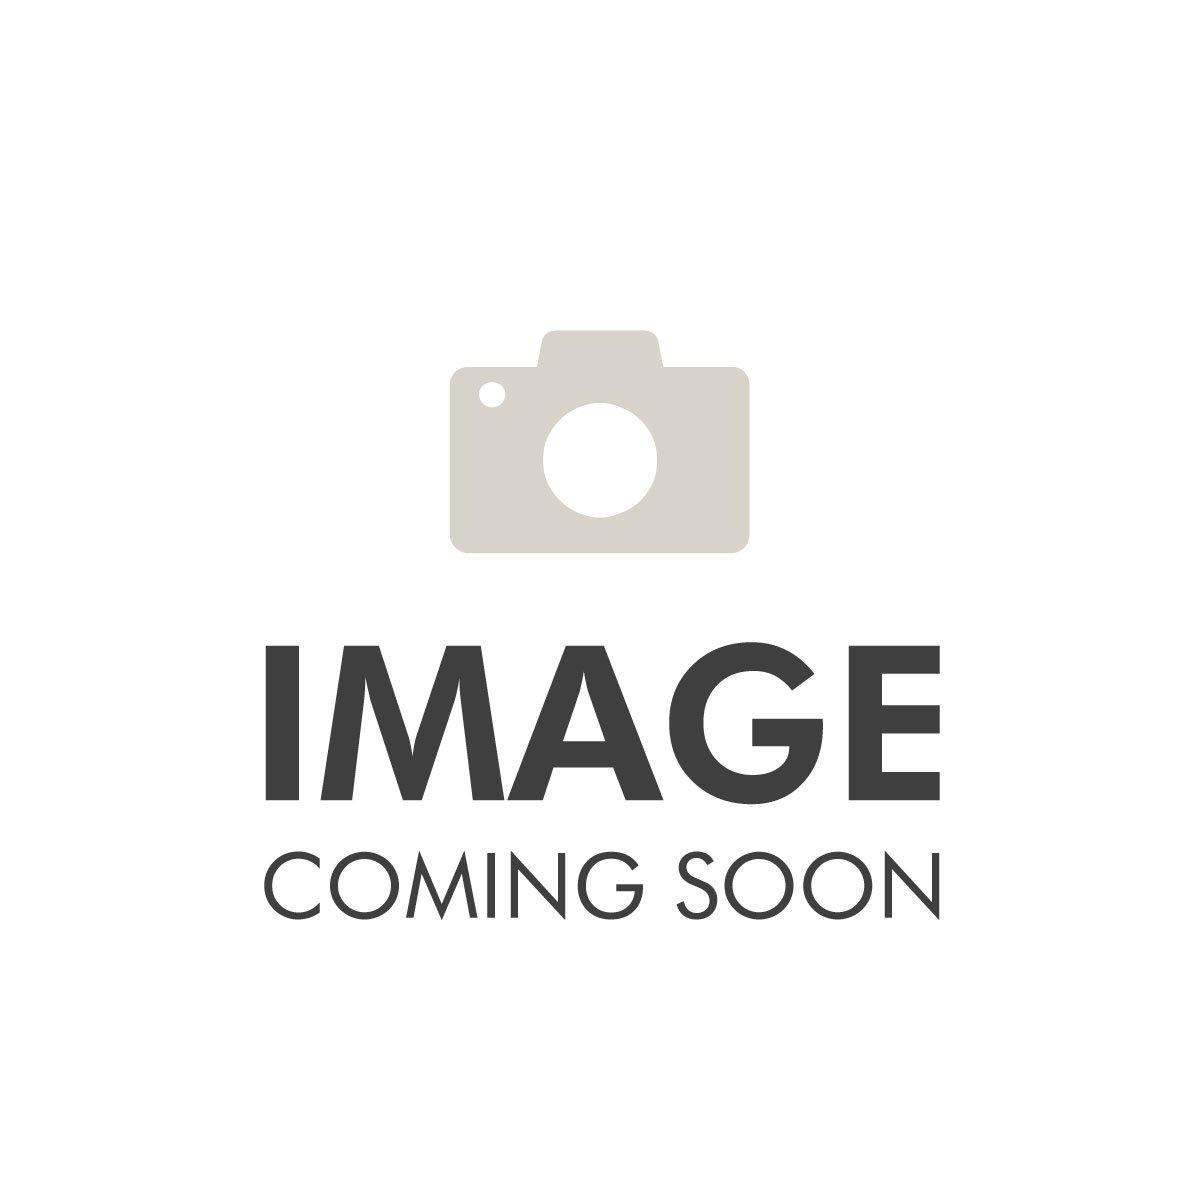 Gucci Bamboo EDT 50ml Spray